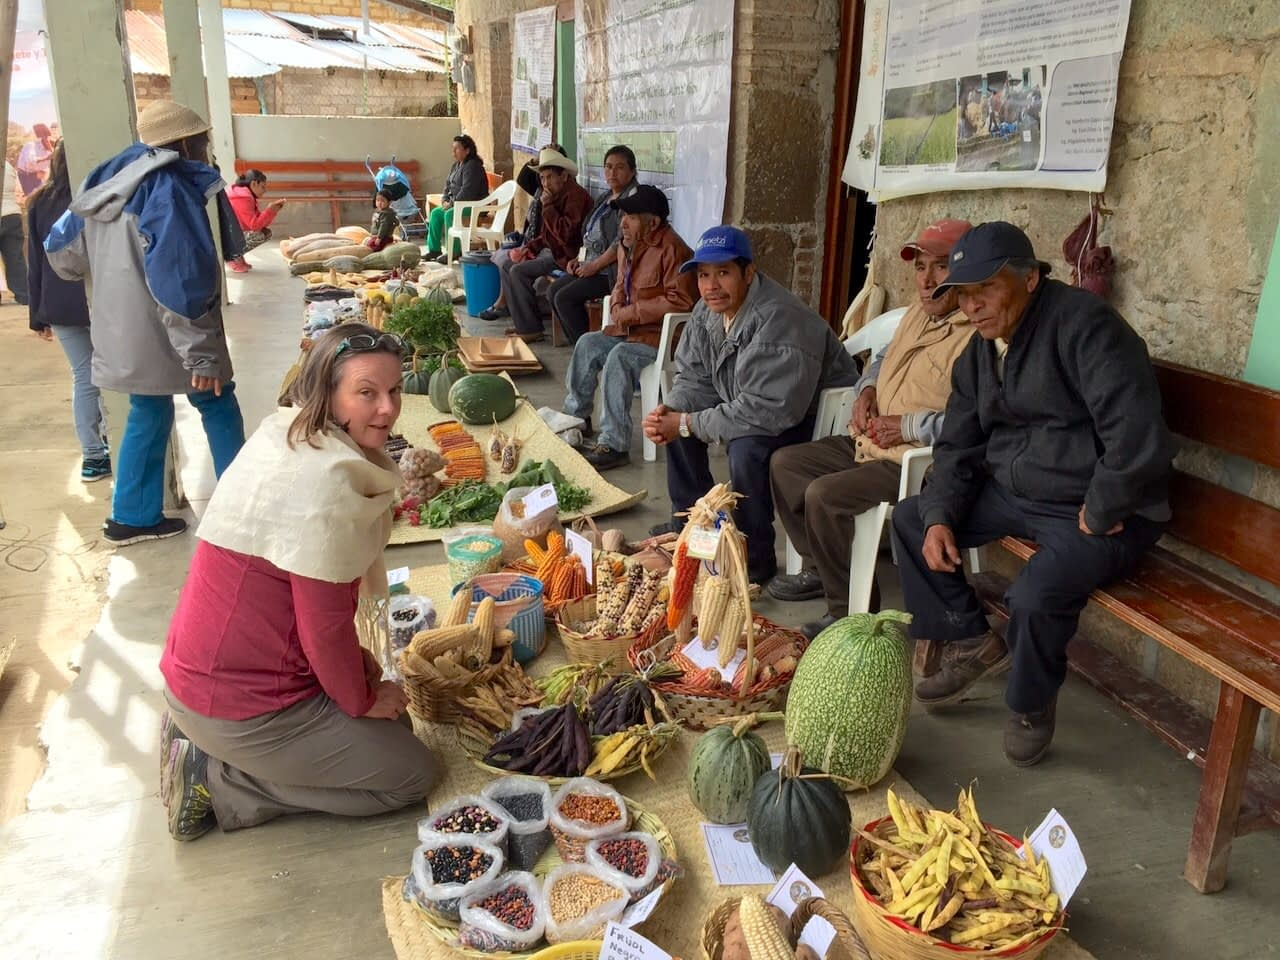 Martha Willcox (left) with farmers and their milpa products in Santa María Yavesía, Oaxaca state, México. (Photo: Arturo Silva/CIMMYT)